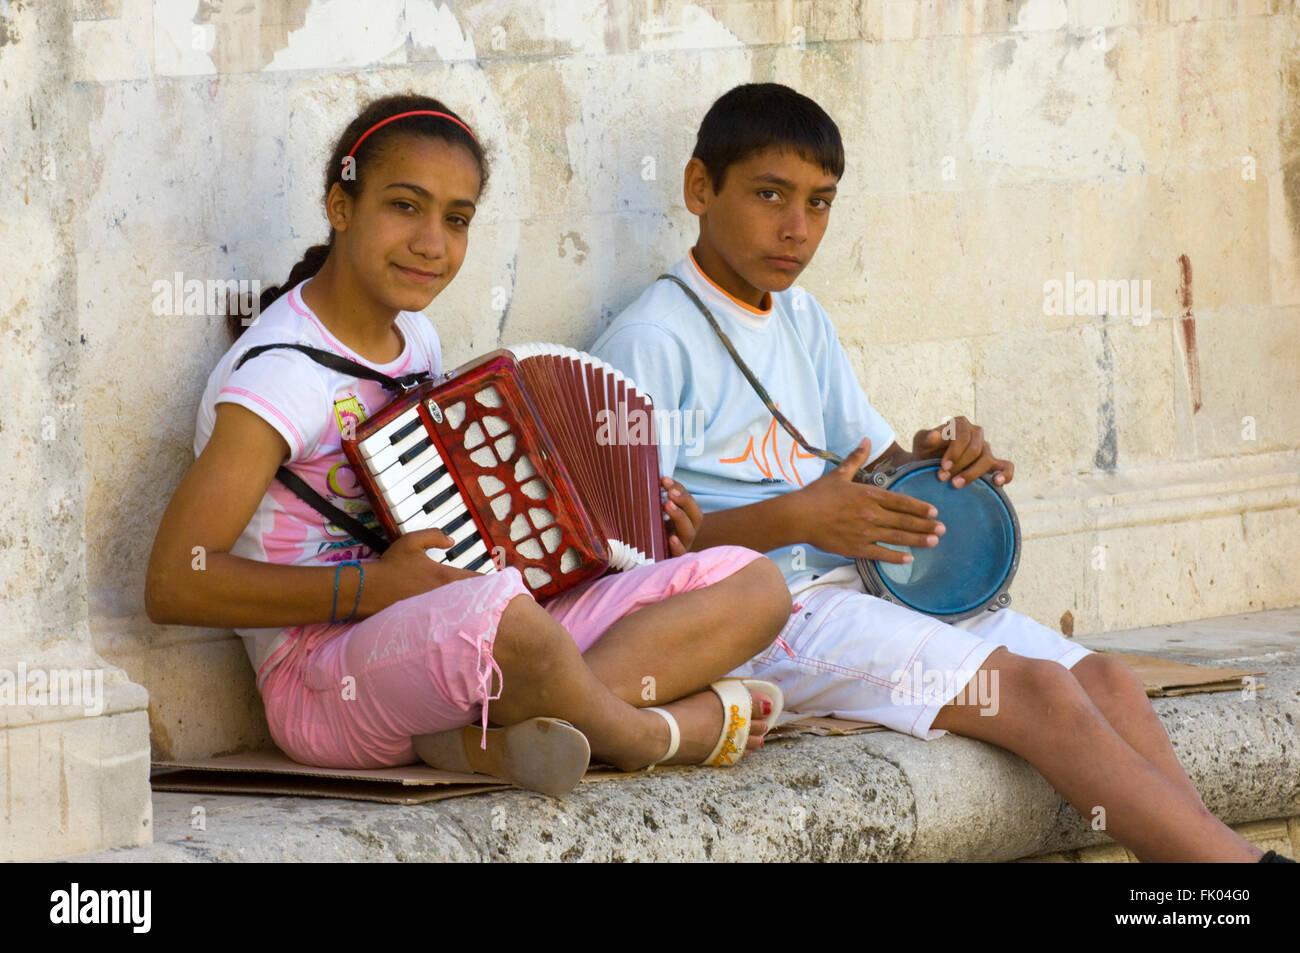 Griechenland, Kreta, Heraklion, junge Strassenmusikanten Imagens de Stock